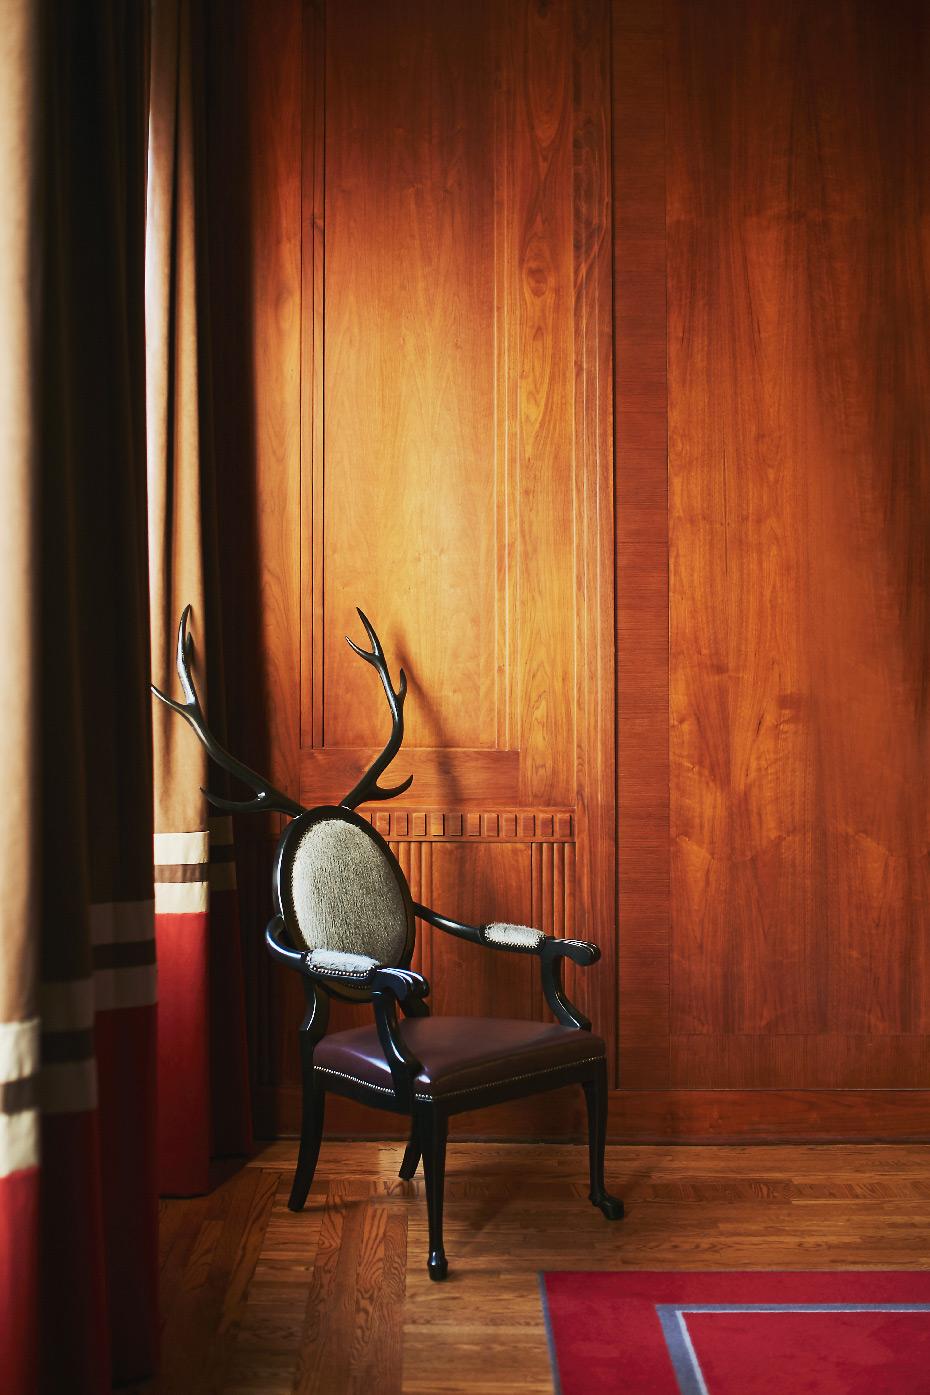 Stacey Van Berkel Photography I Antler chair in Paneled room I The Kimpton Cardinal Hotel I Winston-Salem, North Carolina